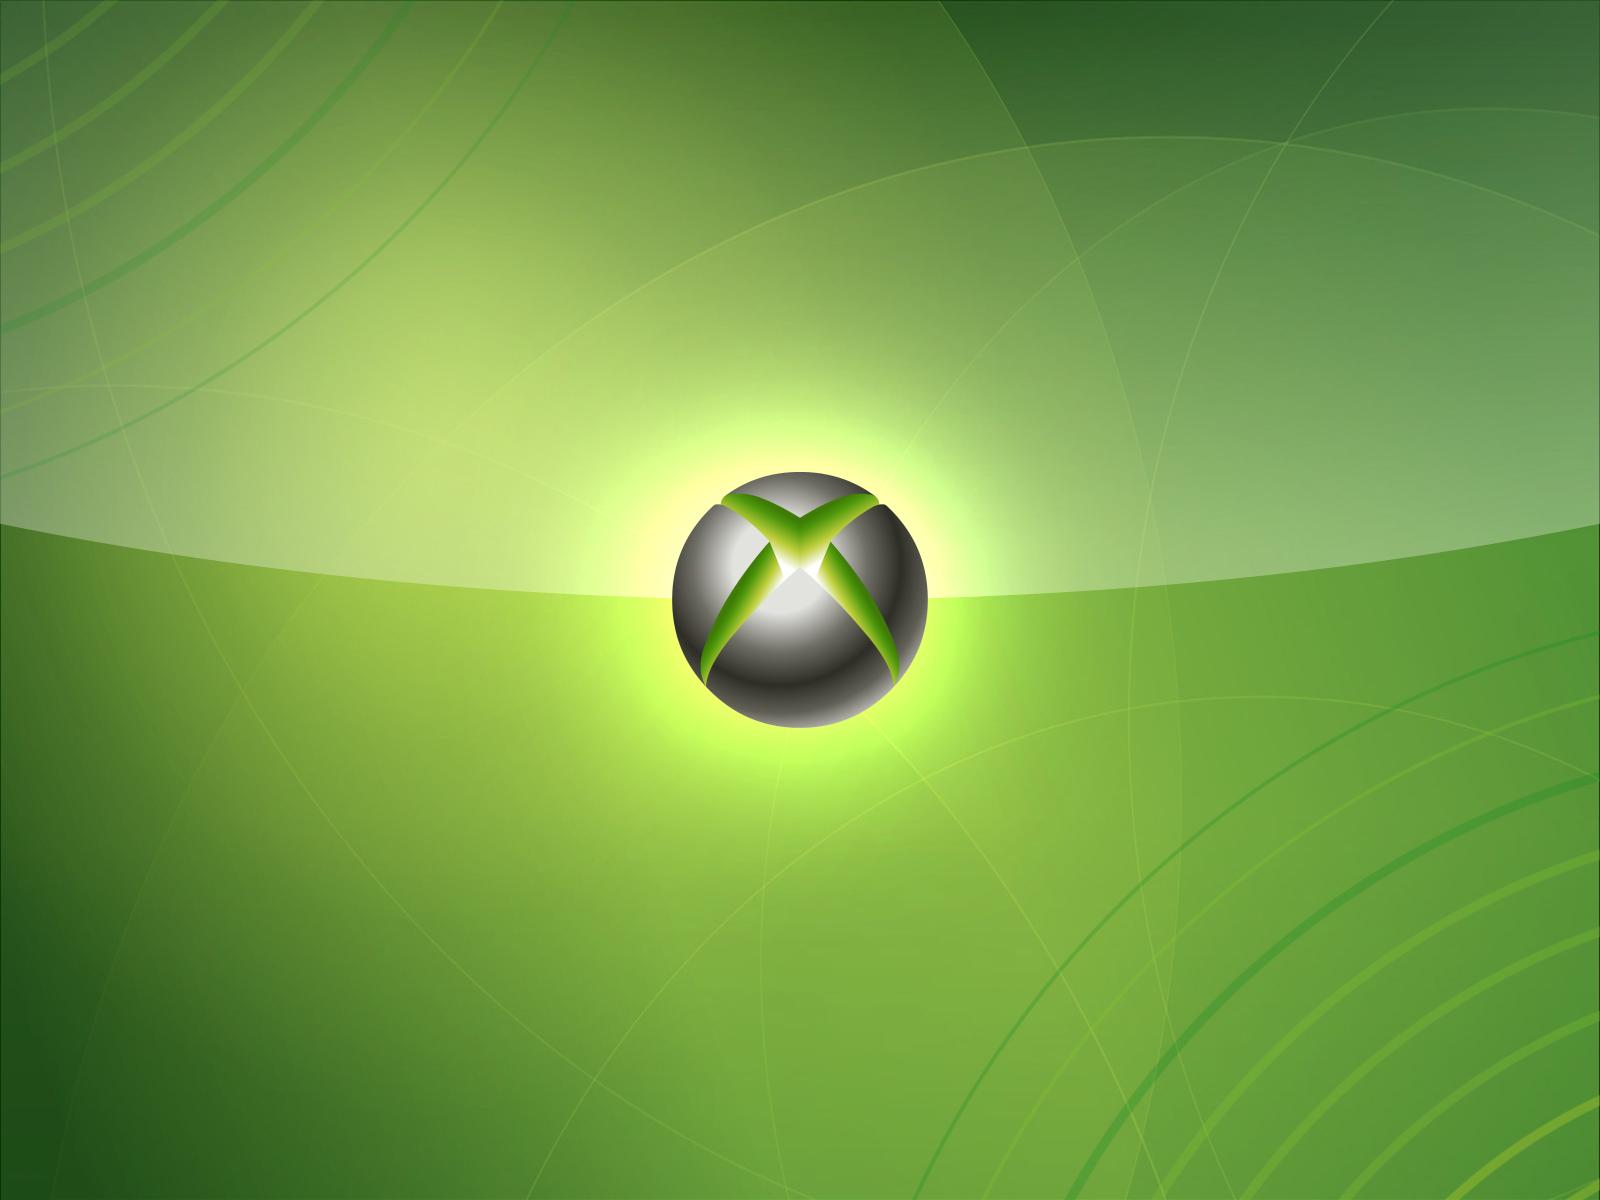 Pics Photos   Xbox 360 Logo 2 Wallpapers Wallpaperlk 1600x1200